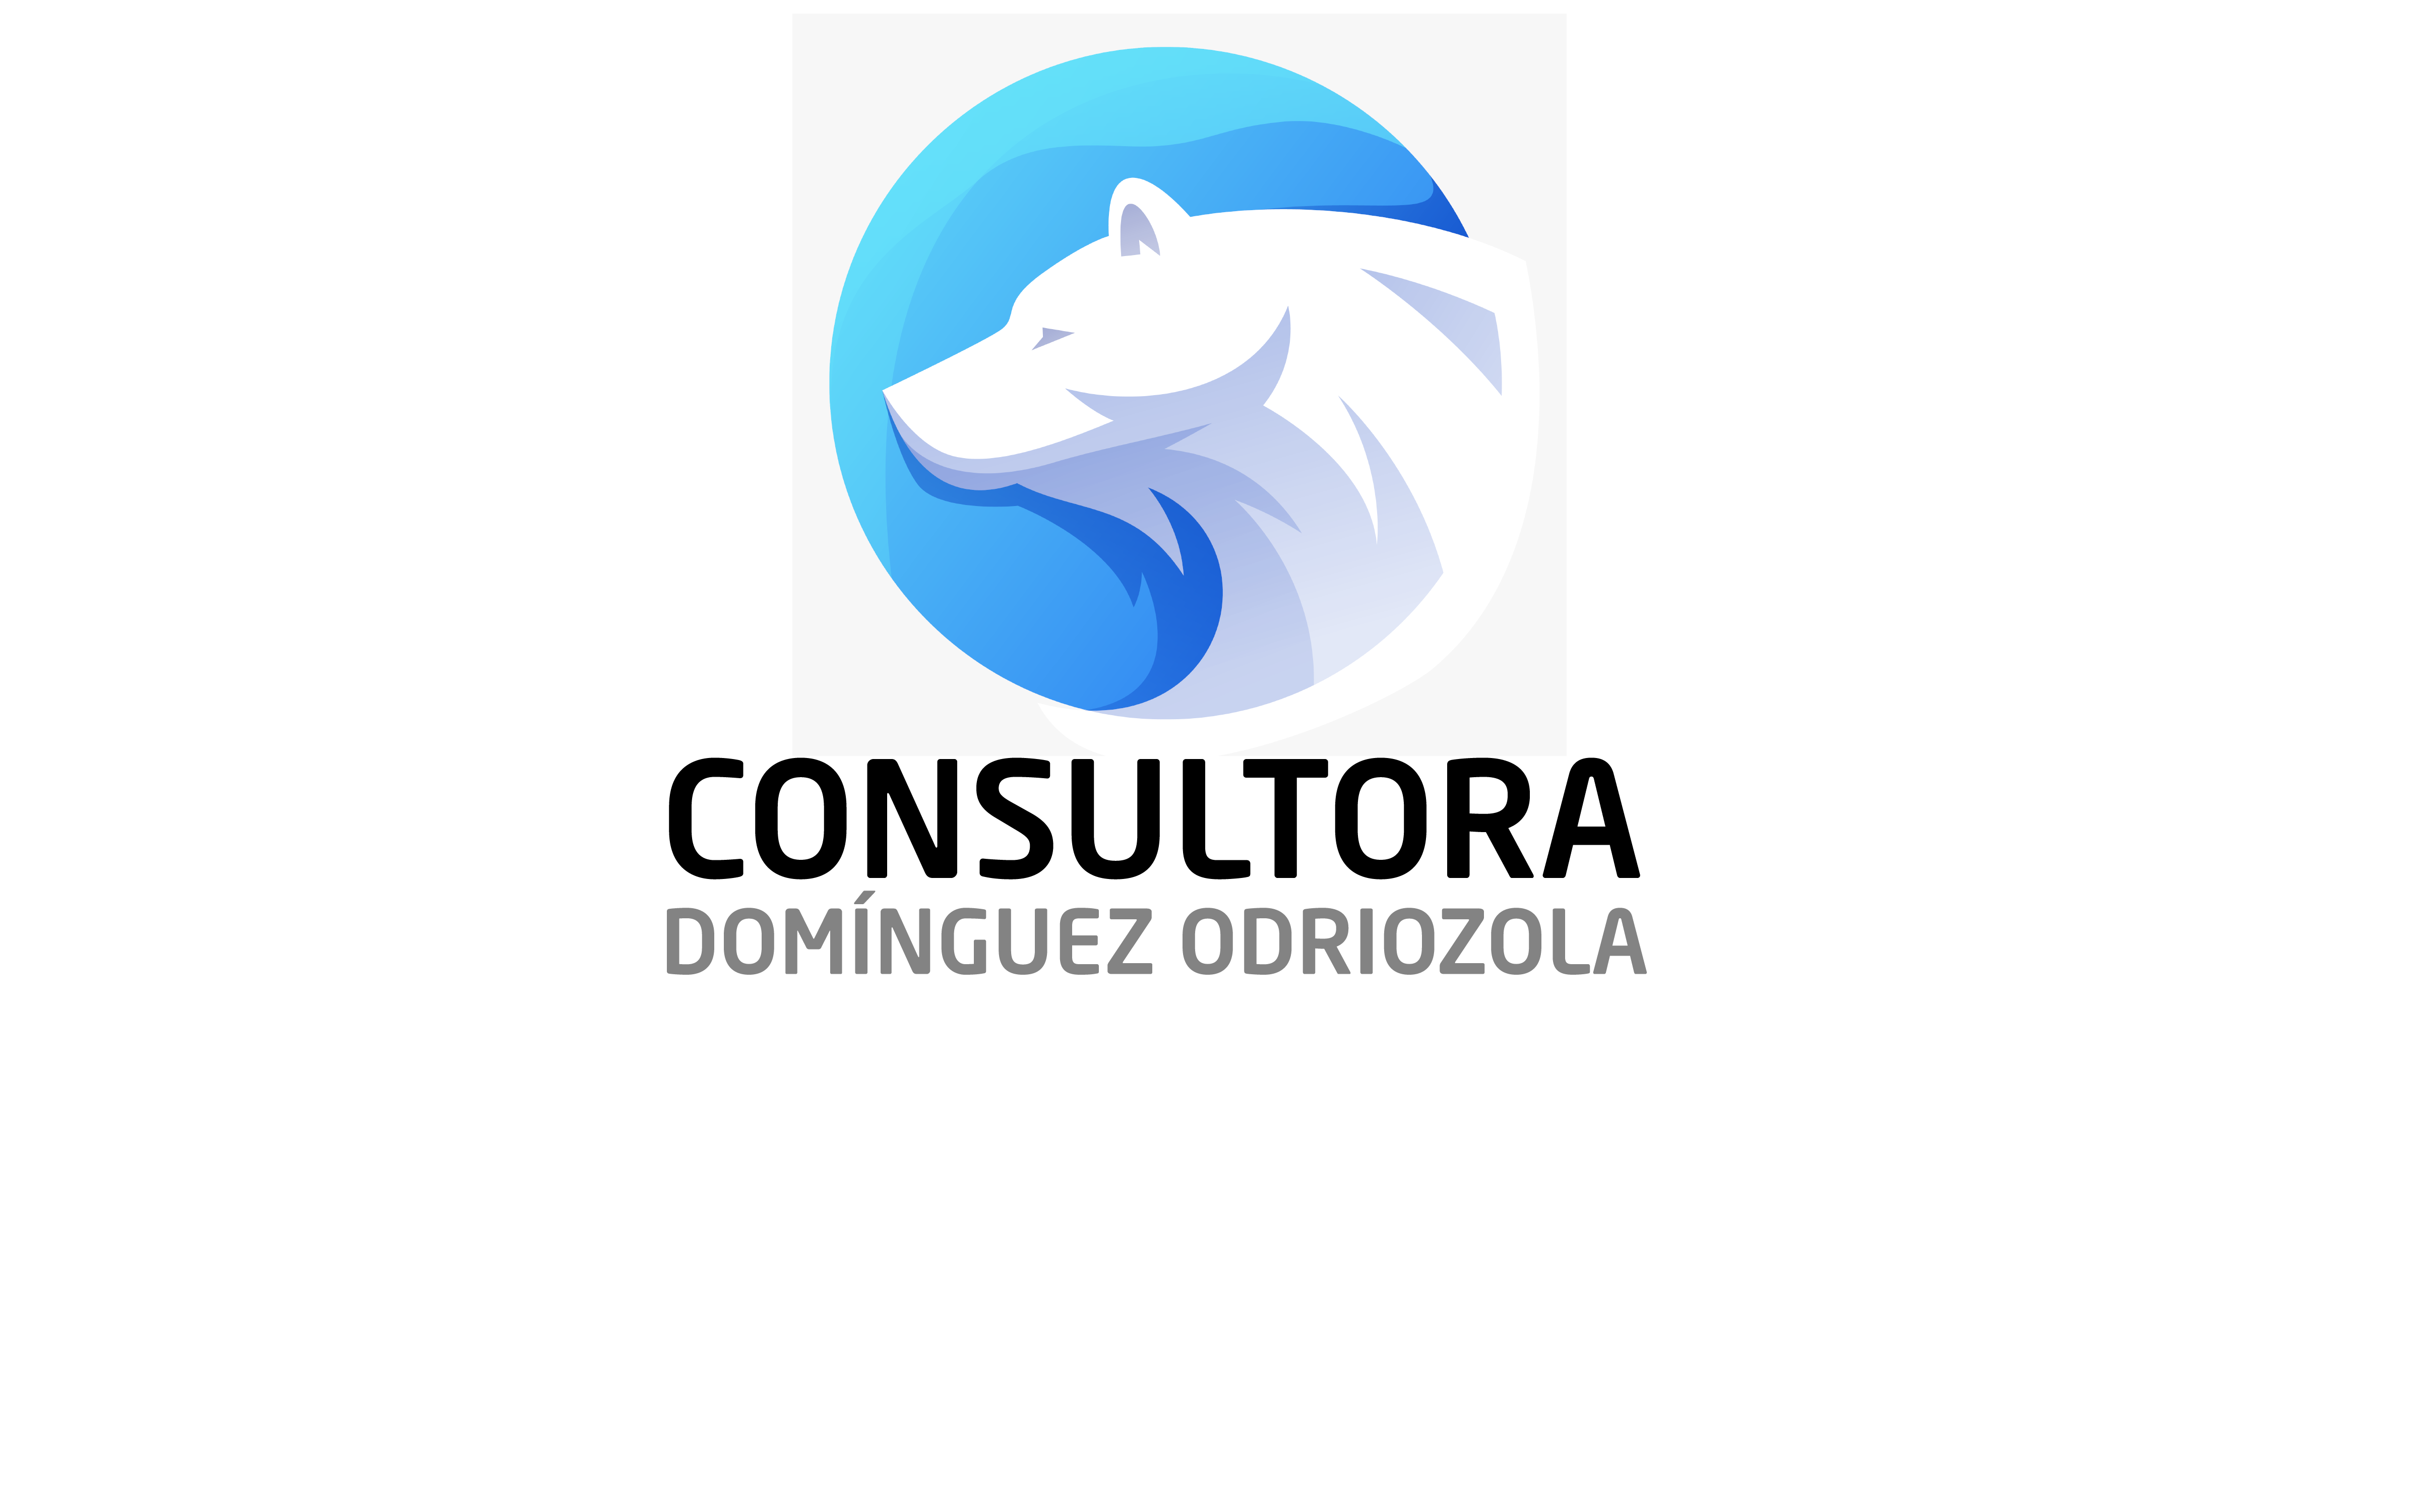 Consultora Domínguez Odriozola